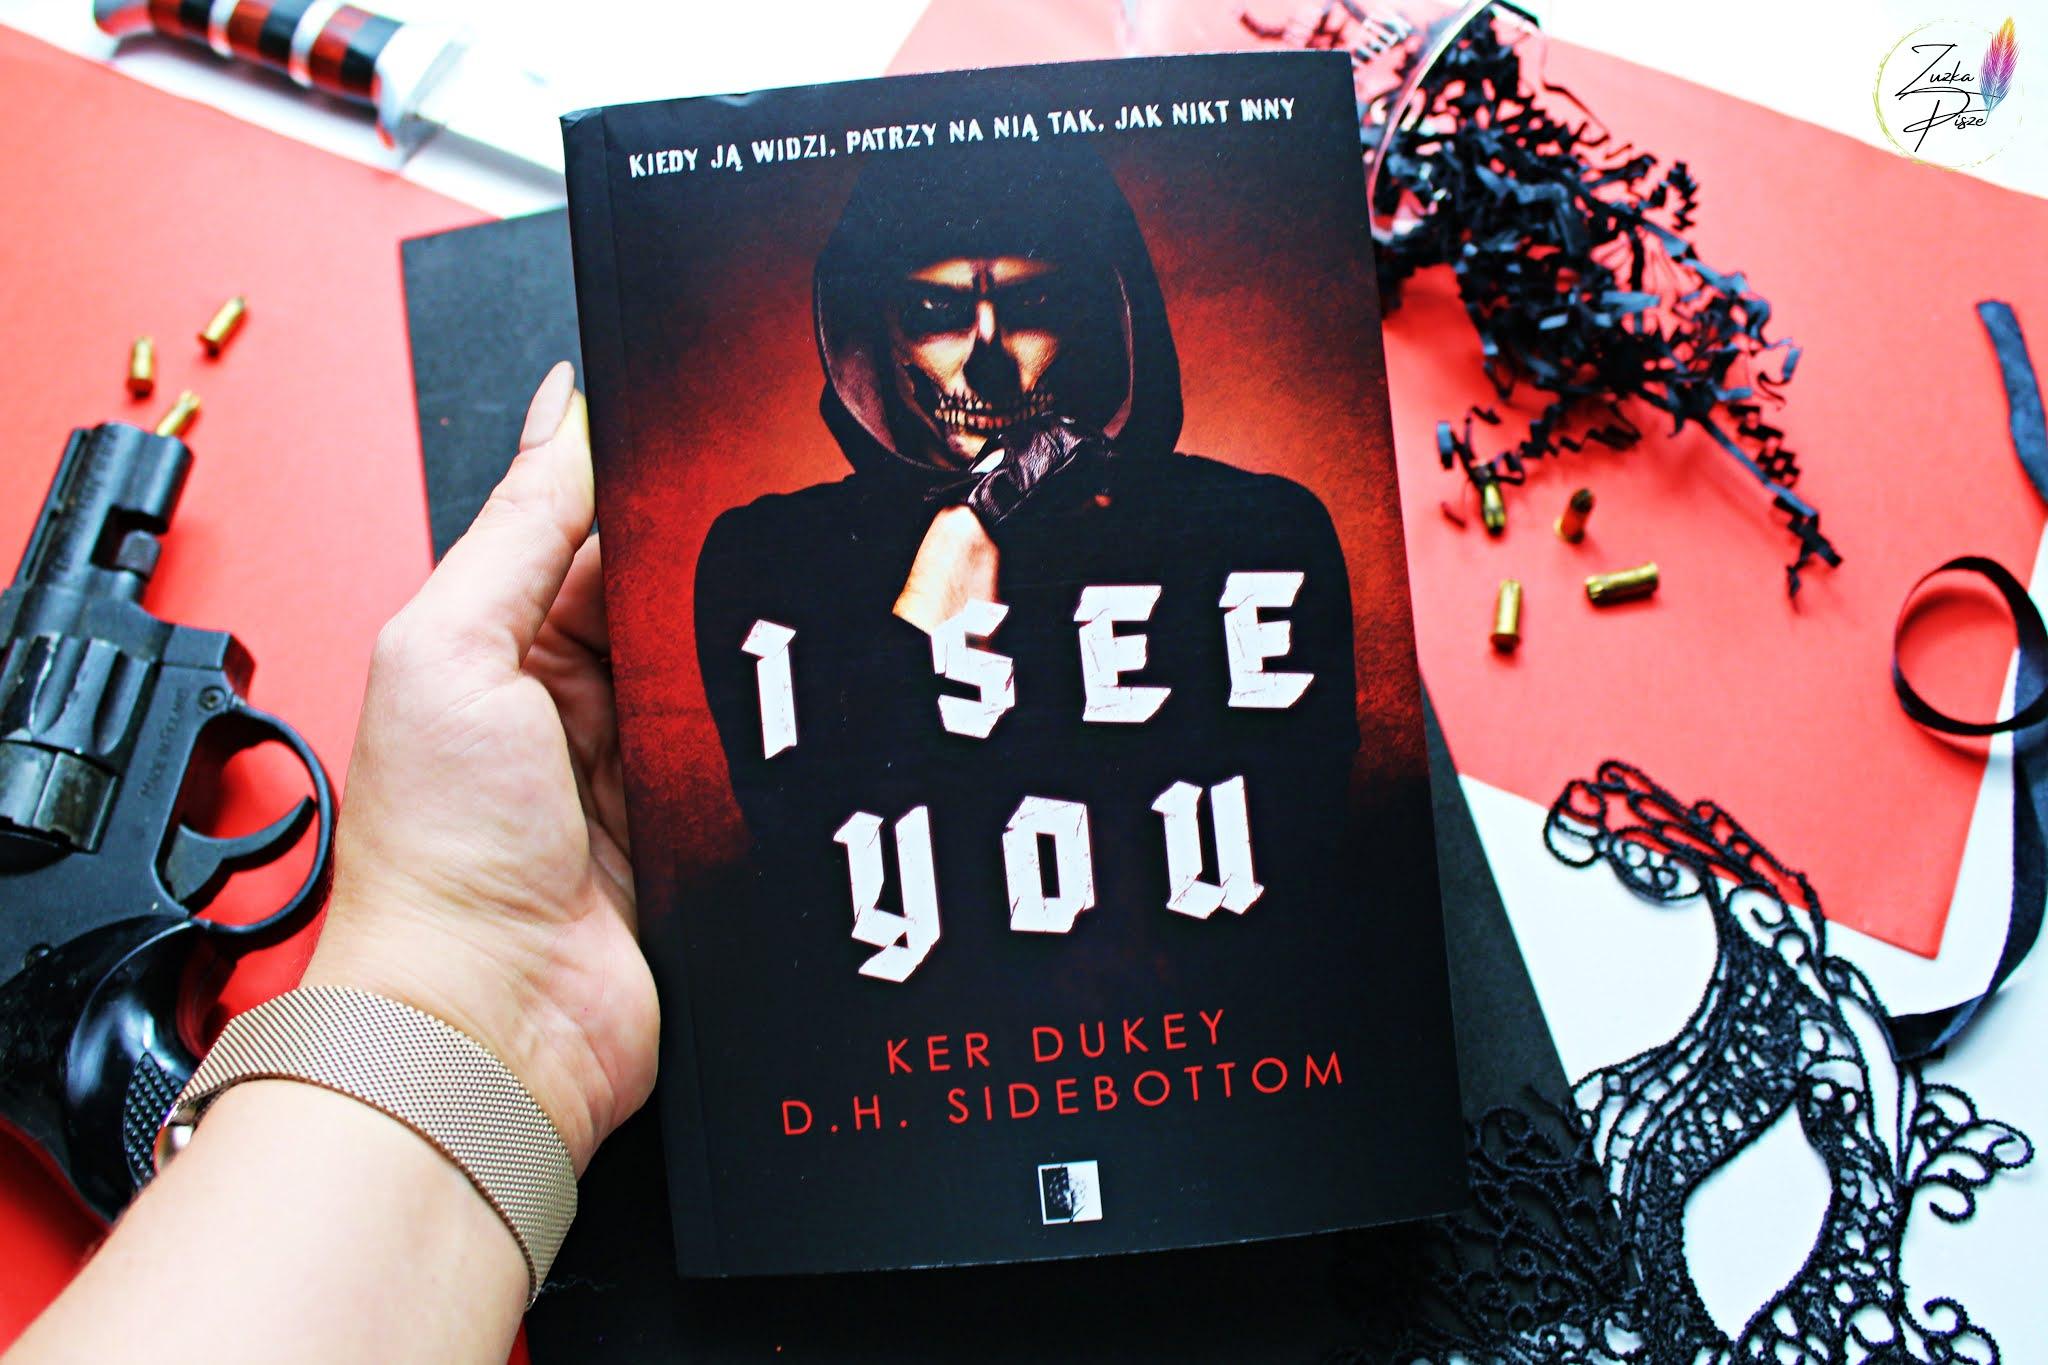 "Ker Dukey & D. H. Sidebottom ""I see you"" - recenzja patronacka"